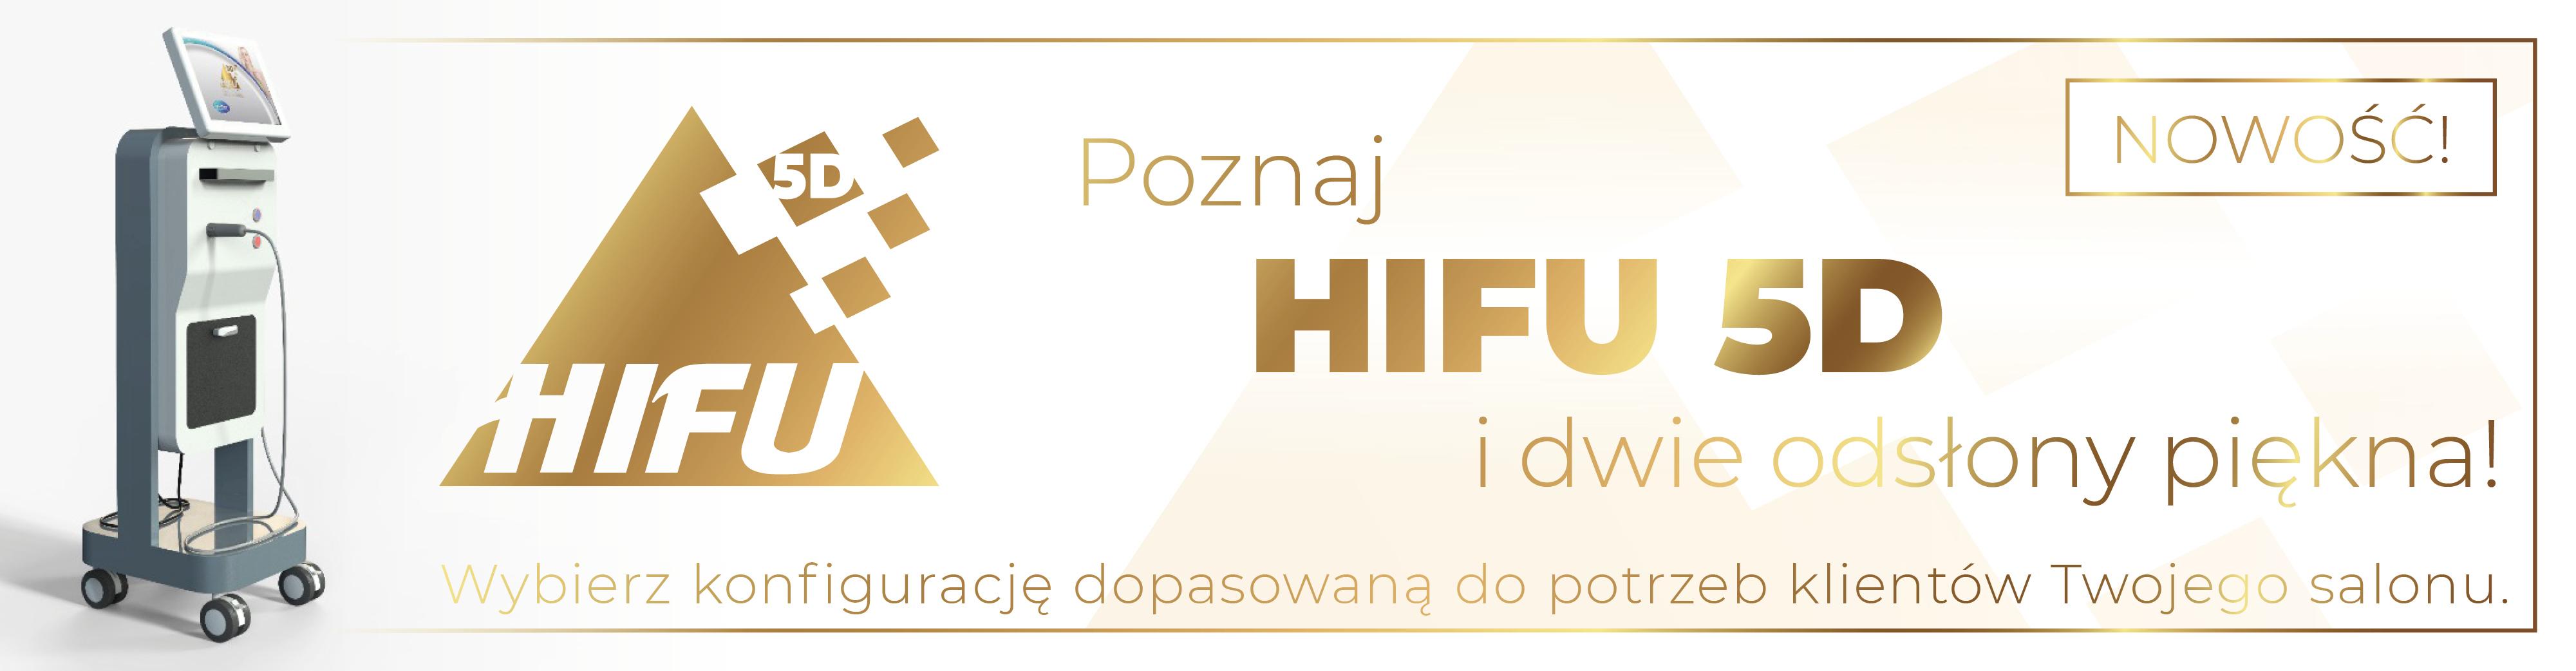 baner_www_HIFU_5D-3